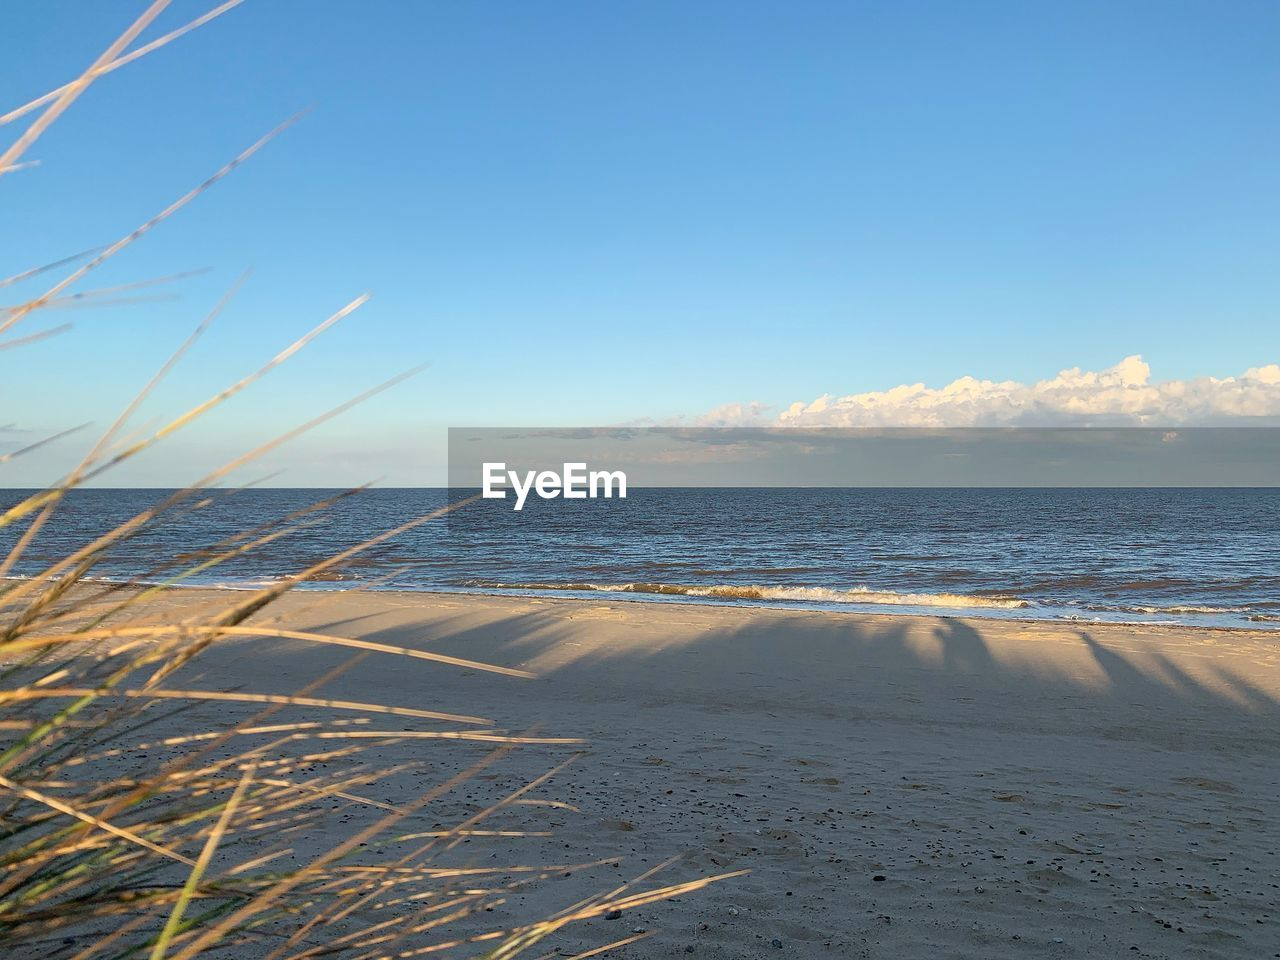 sea, water, sky, beach, land, tranquility, tranquil scene, beauty in nature, scenics - nature, sand, horizon over water, horizon, nature, no people, cloud - sky, sunlight, non-urban scene, day, idyllic